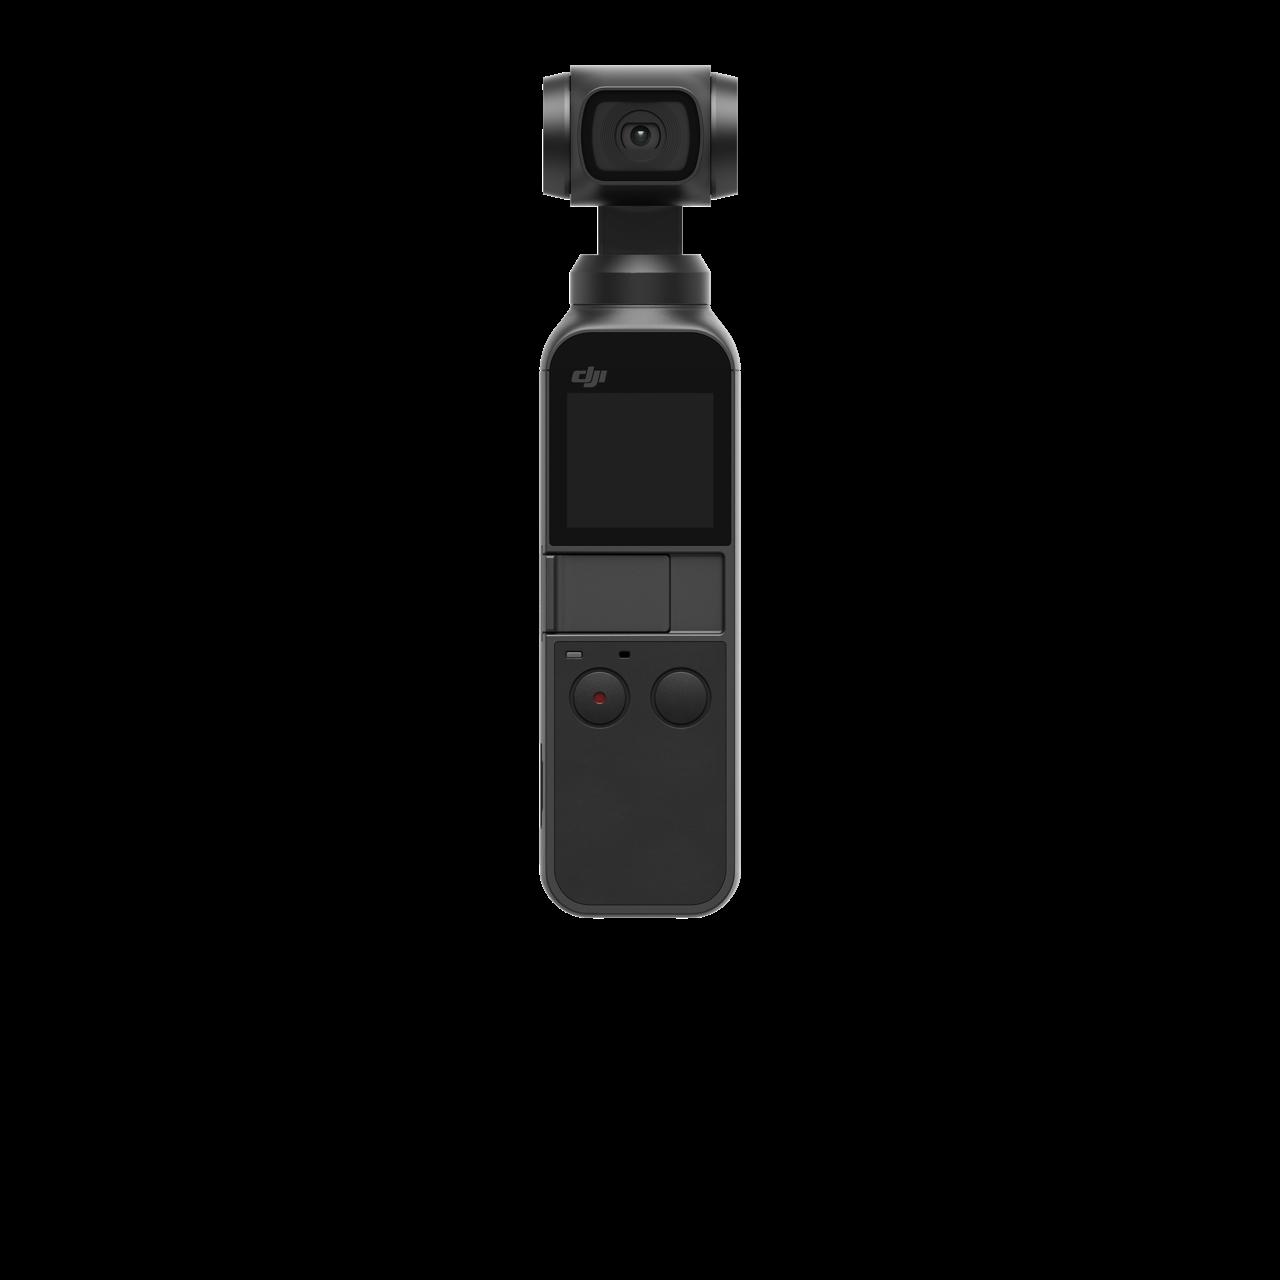 Gimbal Protector for DJI Spark,Hapurs Transparent Camera Lens Cover Gimbal Cover Sensor Screen Protector Cap for DJI SPARK Drone 2-Pack